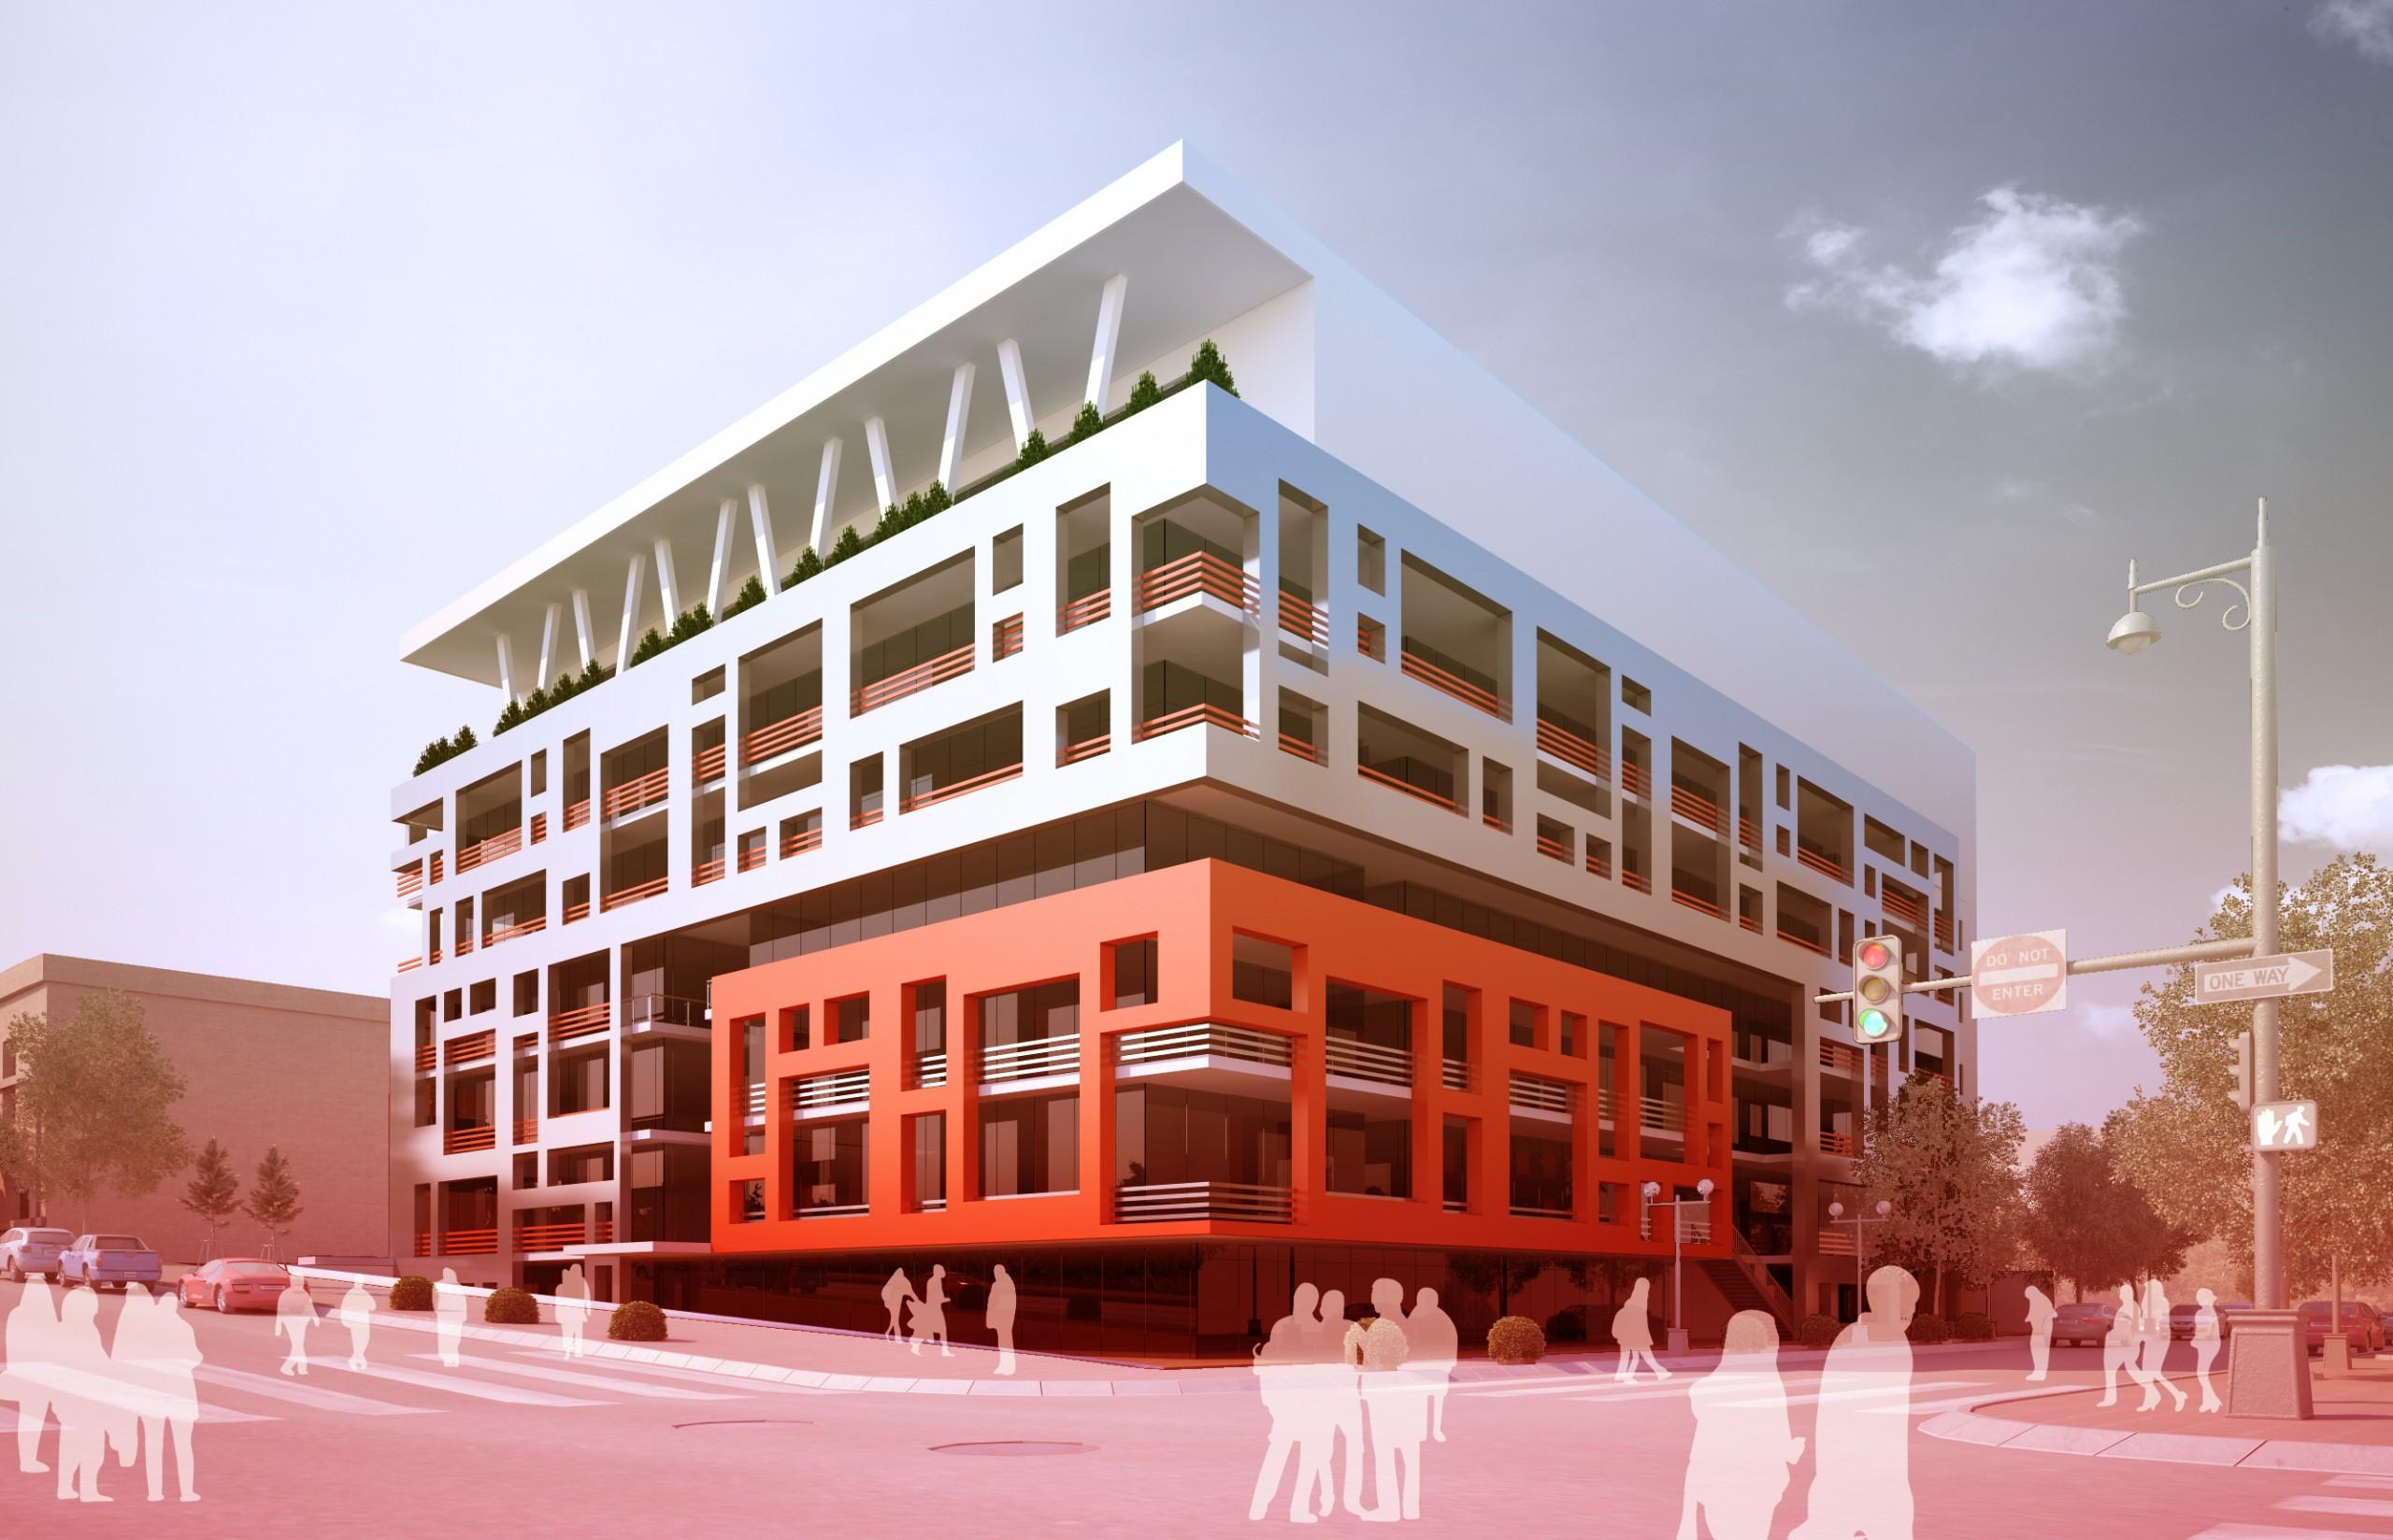 Goze 4 scaled - Goze Commercial Center